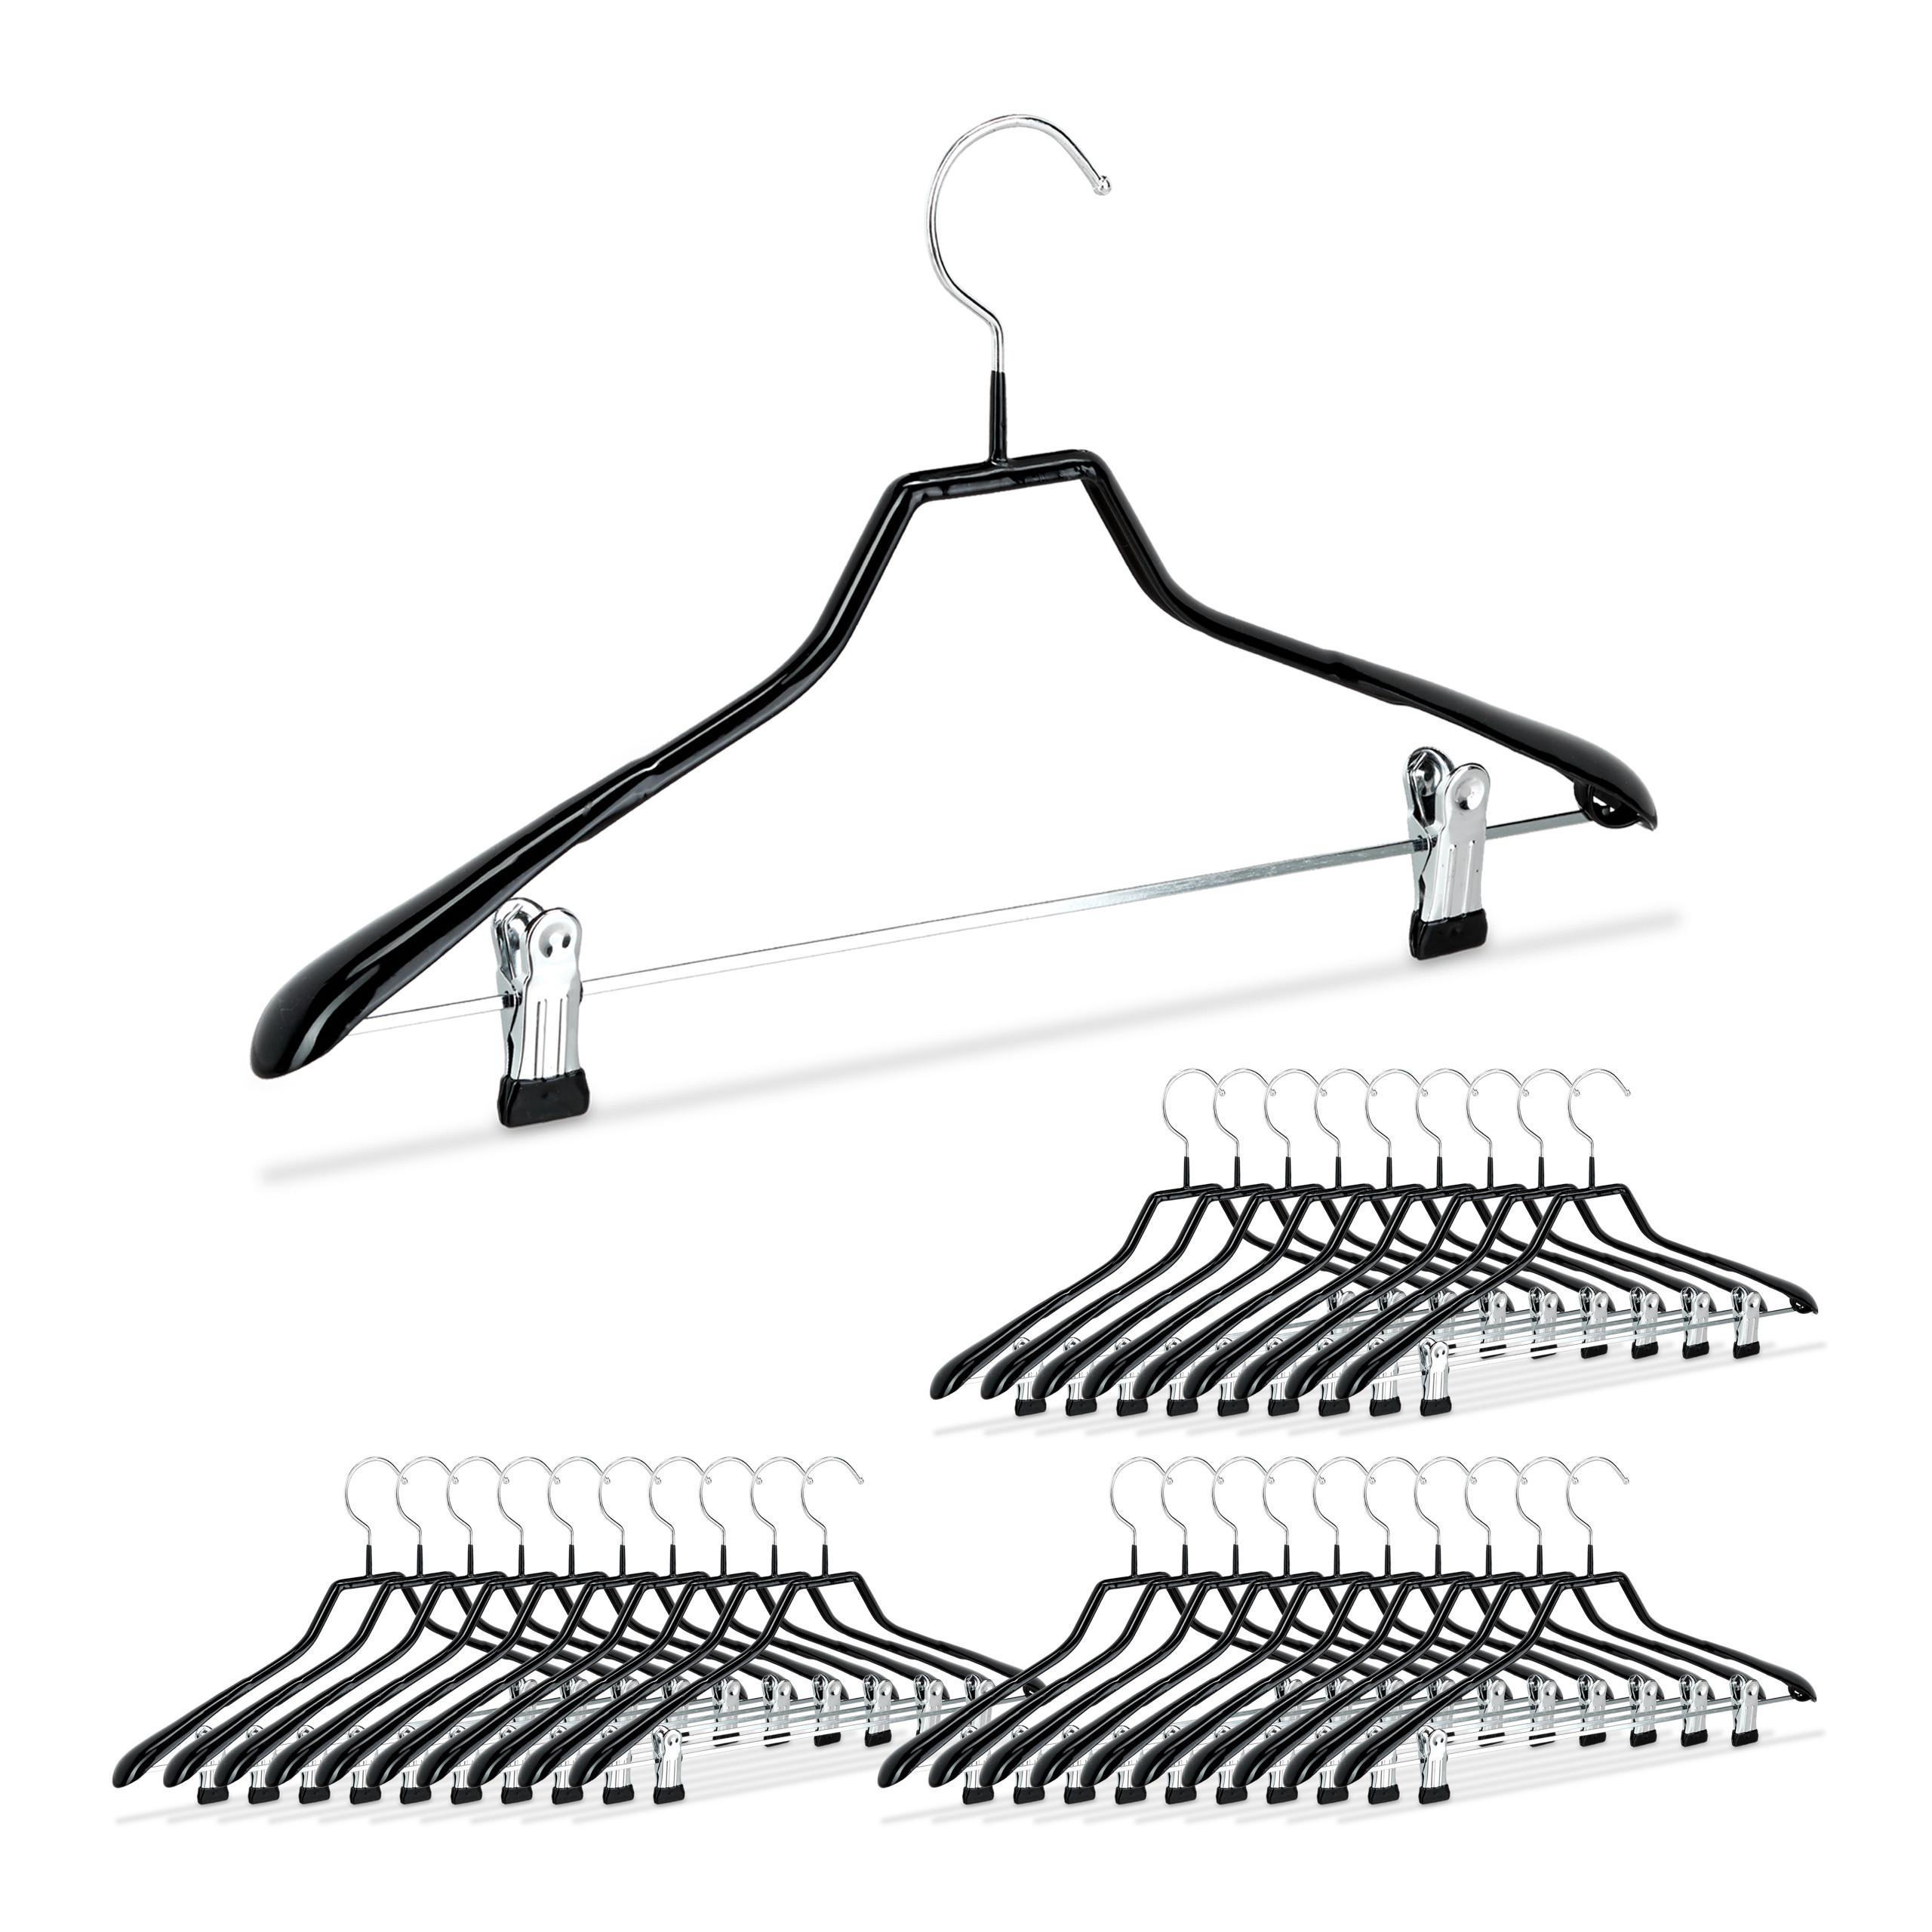 100 x Anzugbügel Metall schwarz Hosenbügel rutschfest gummiert Kleiderbügel